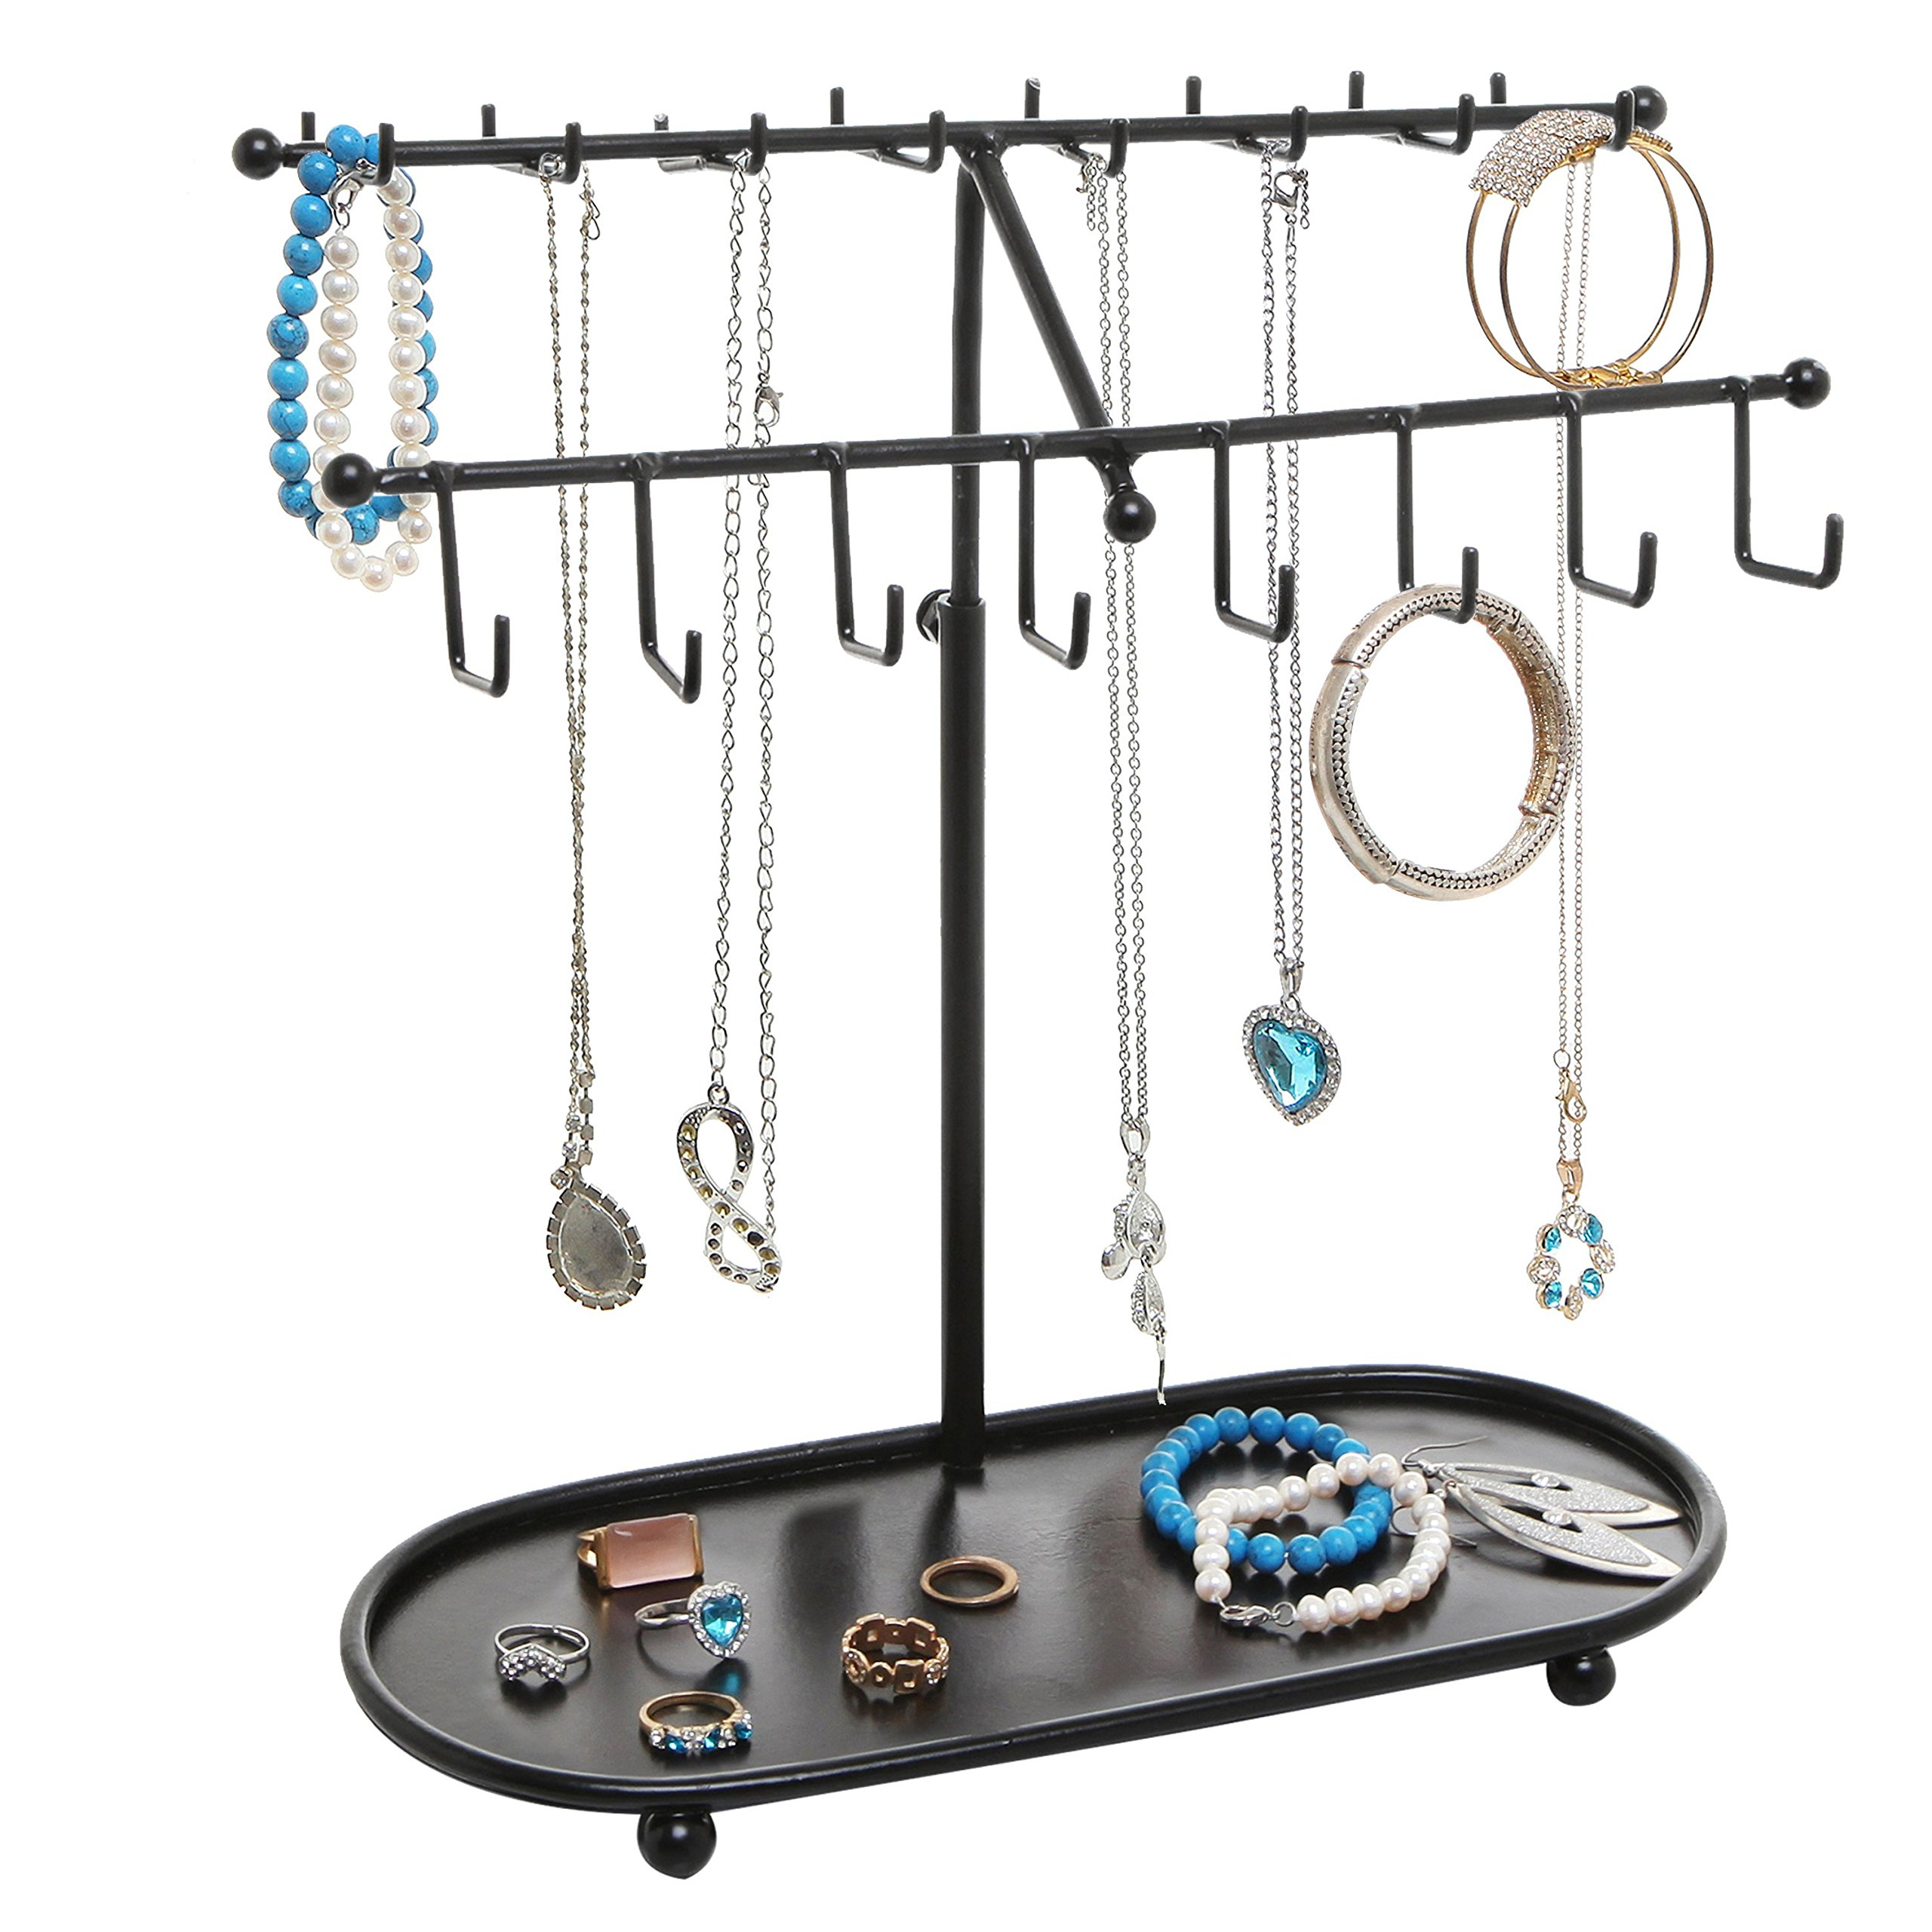 15 Inch Black Metal Height Adjustable 24 Hook Jewelry Organizer / Necklace & Bracelet Hanger w/ Ring Tray